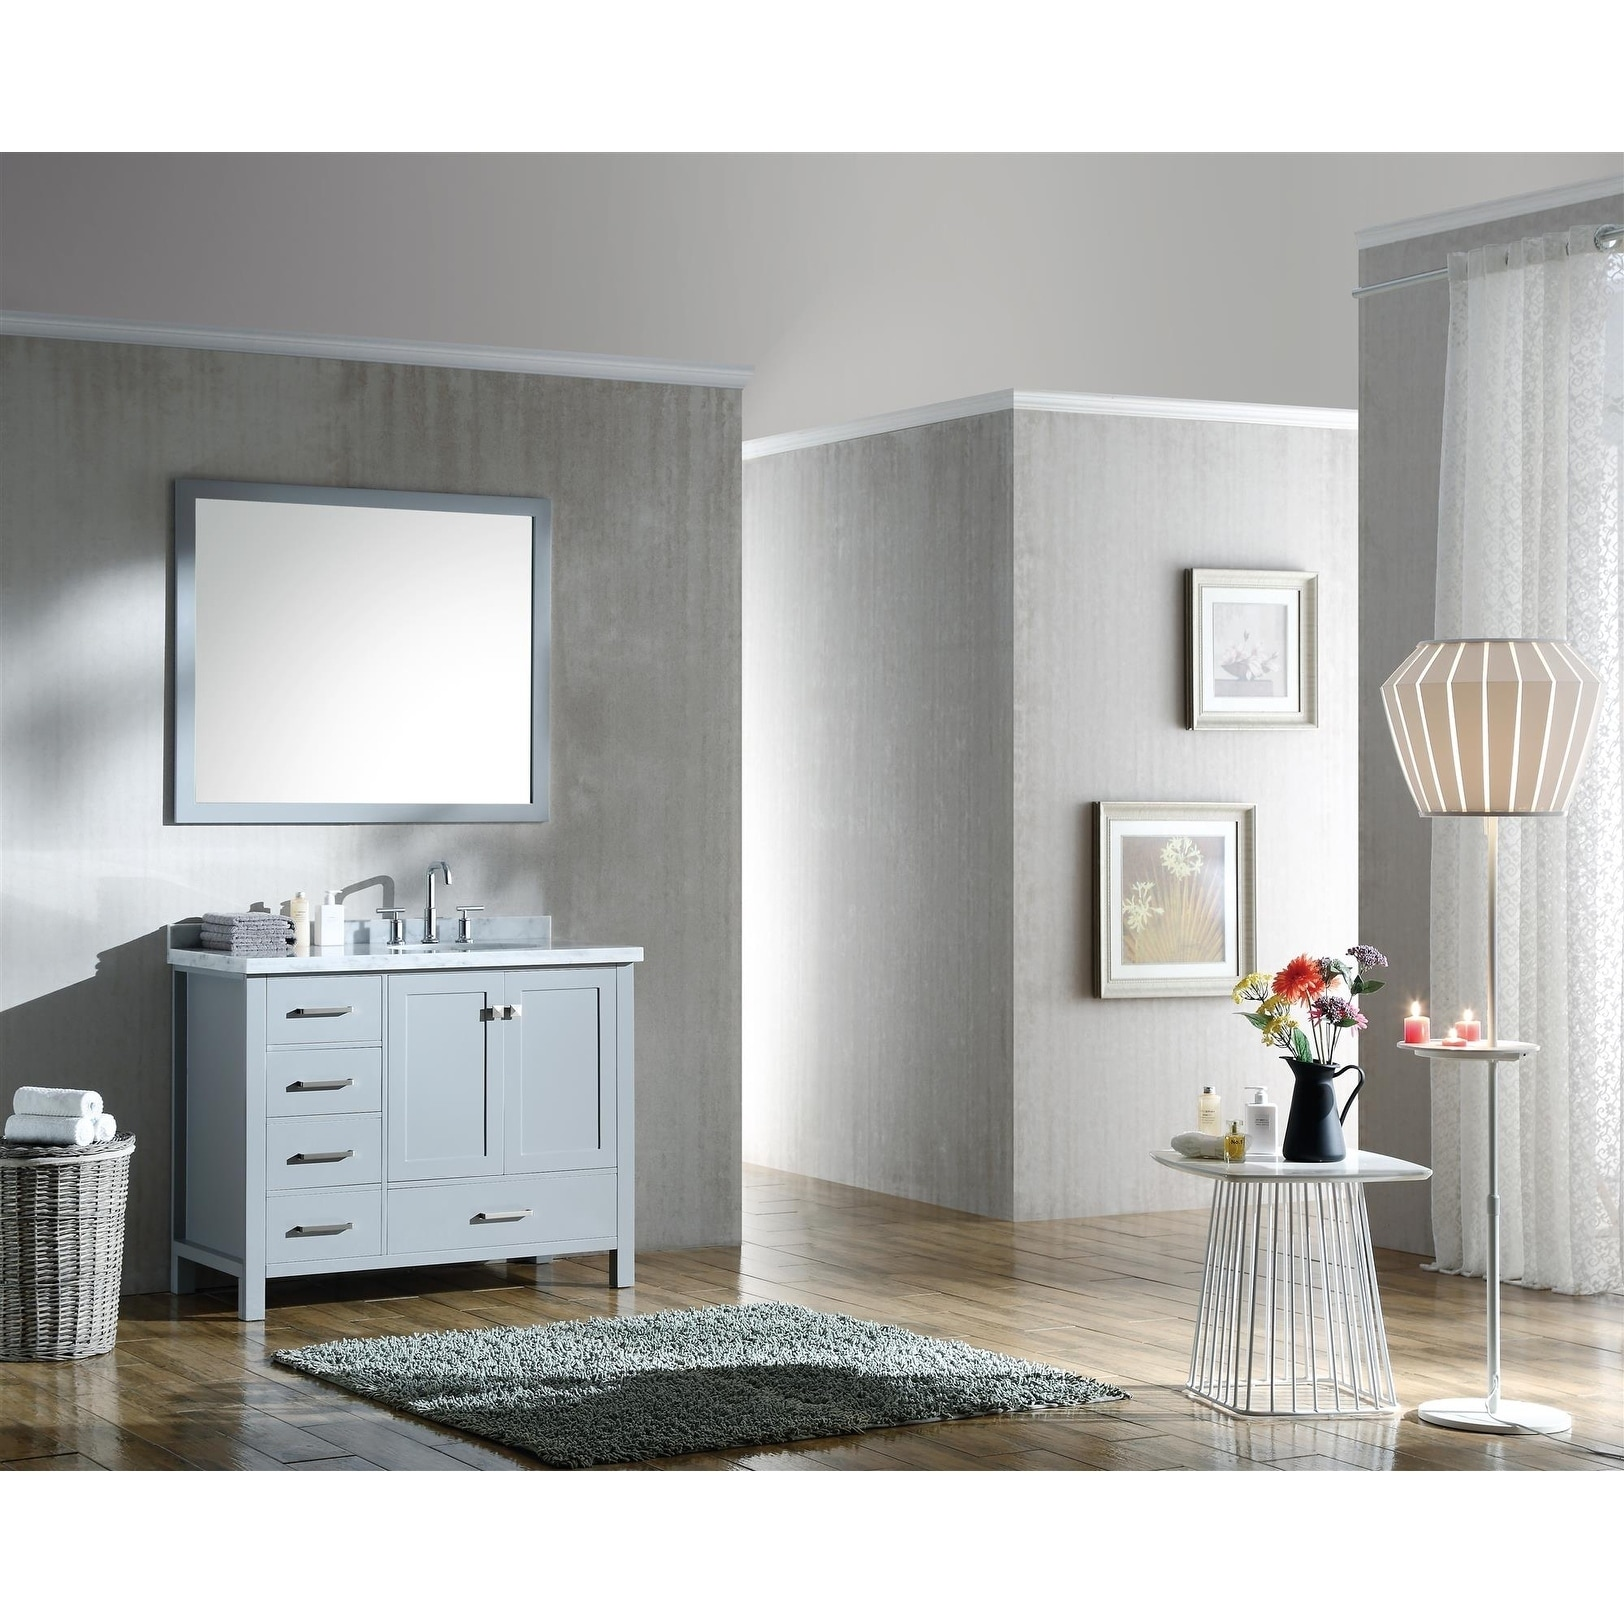 ariel cambridge 43 right offset single oval sink vanity set in grey